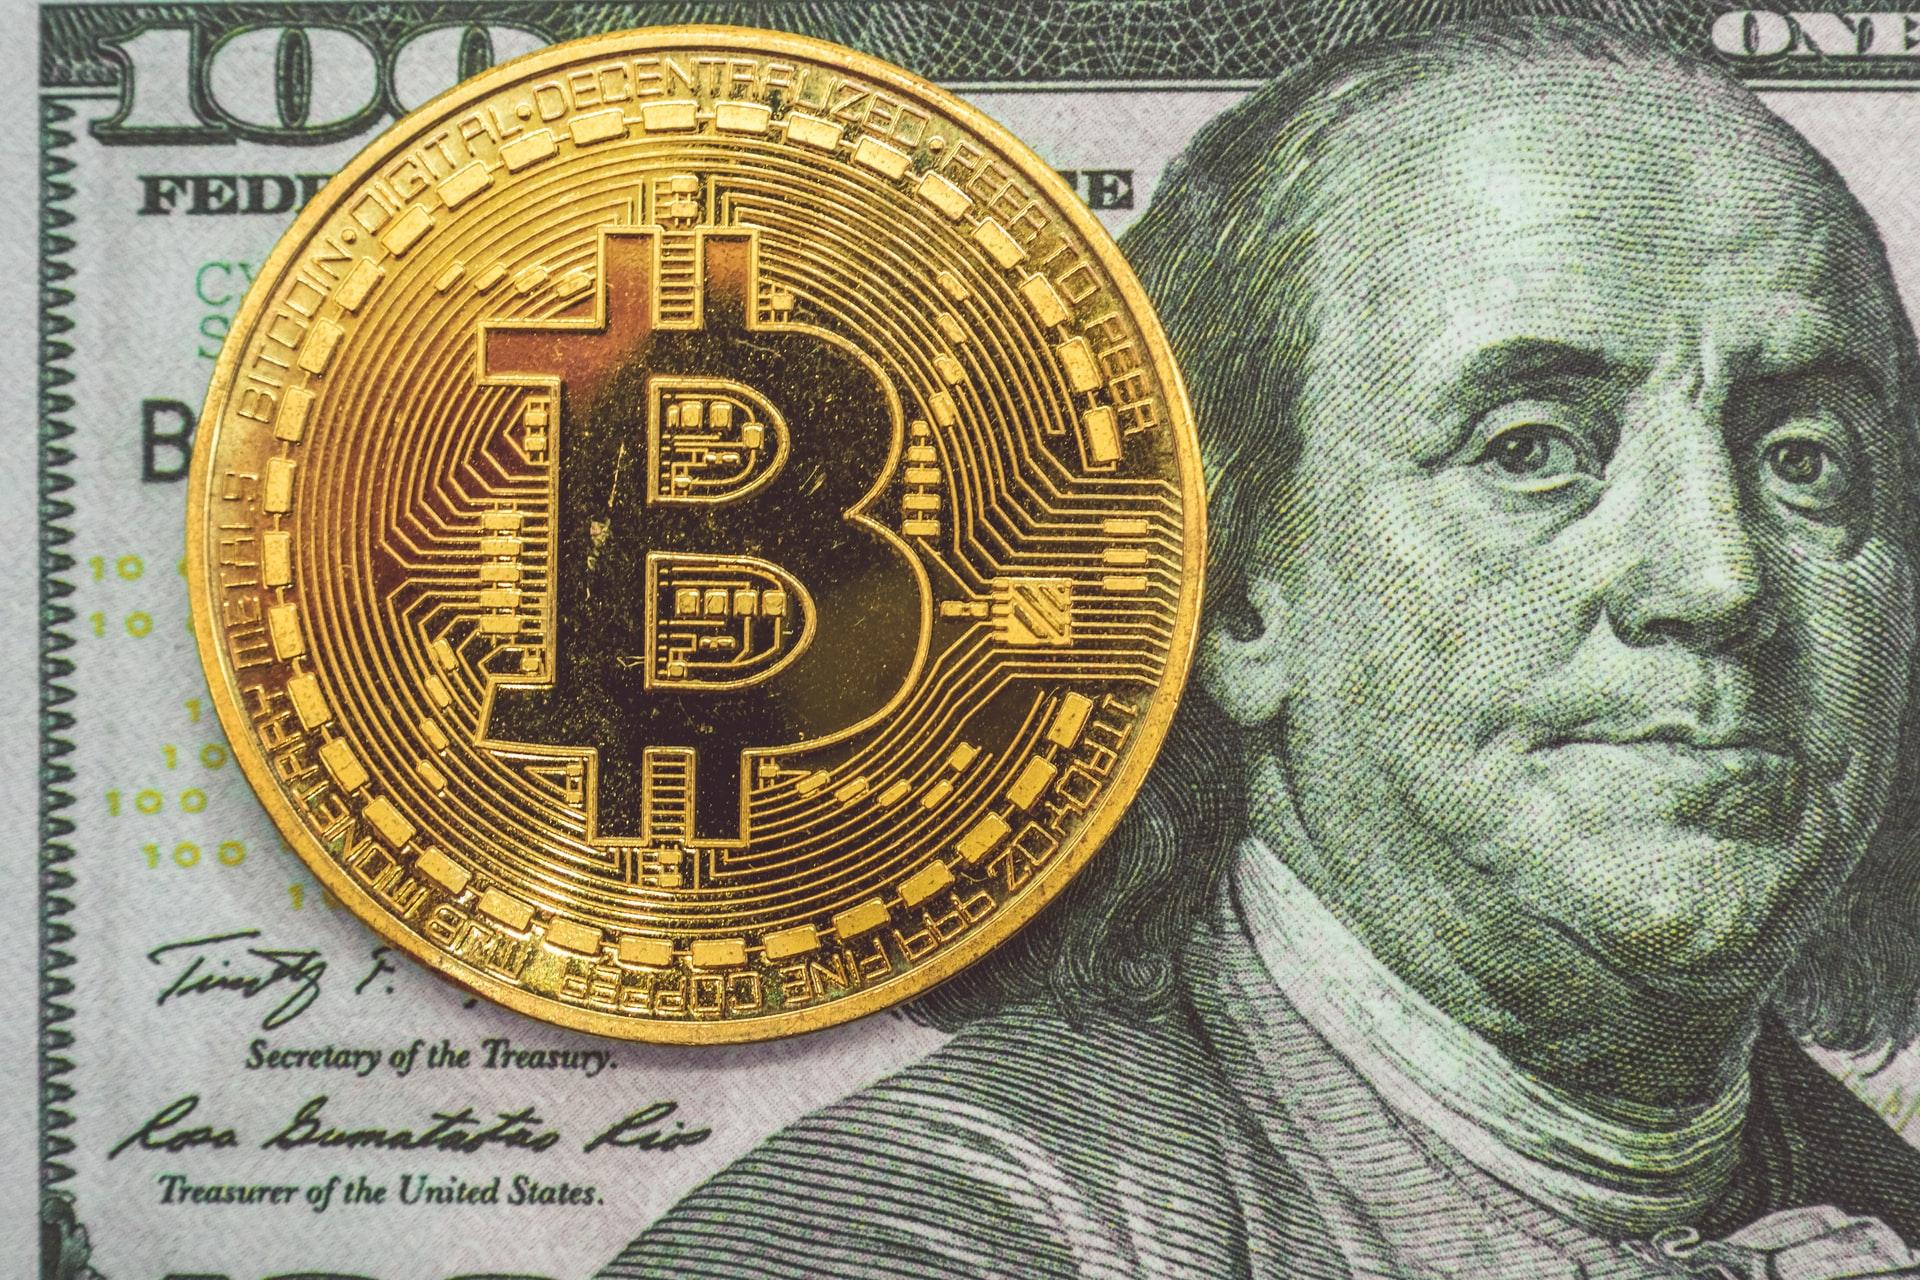 Boom for Bitcoin as Macro Analysts Stick to Their Bearish Dollar Calls